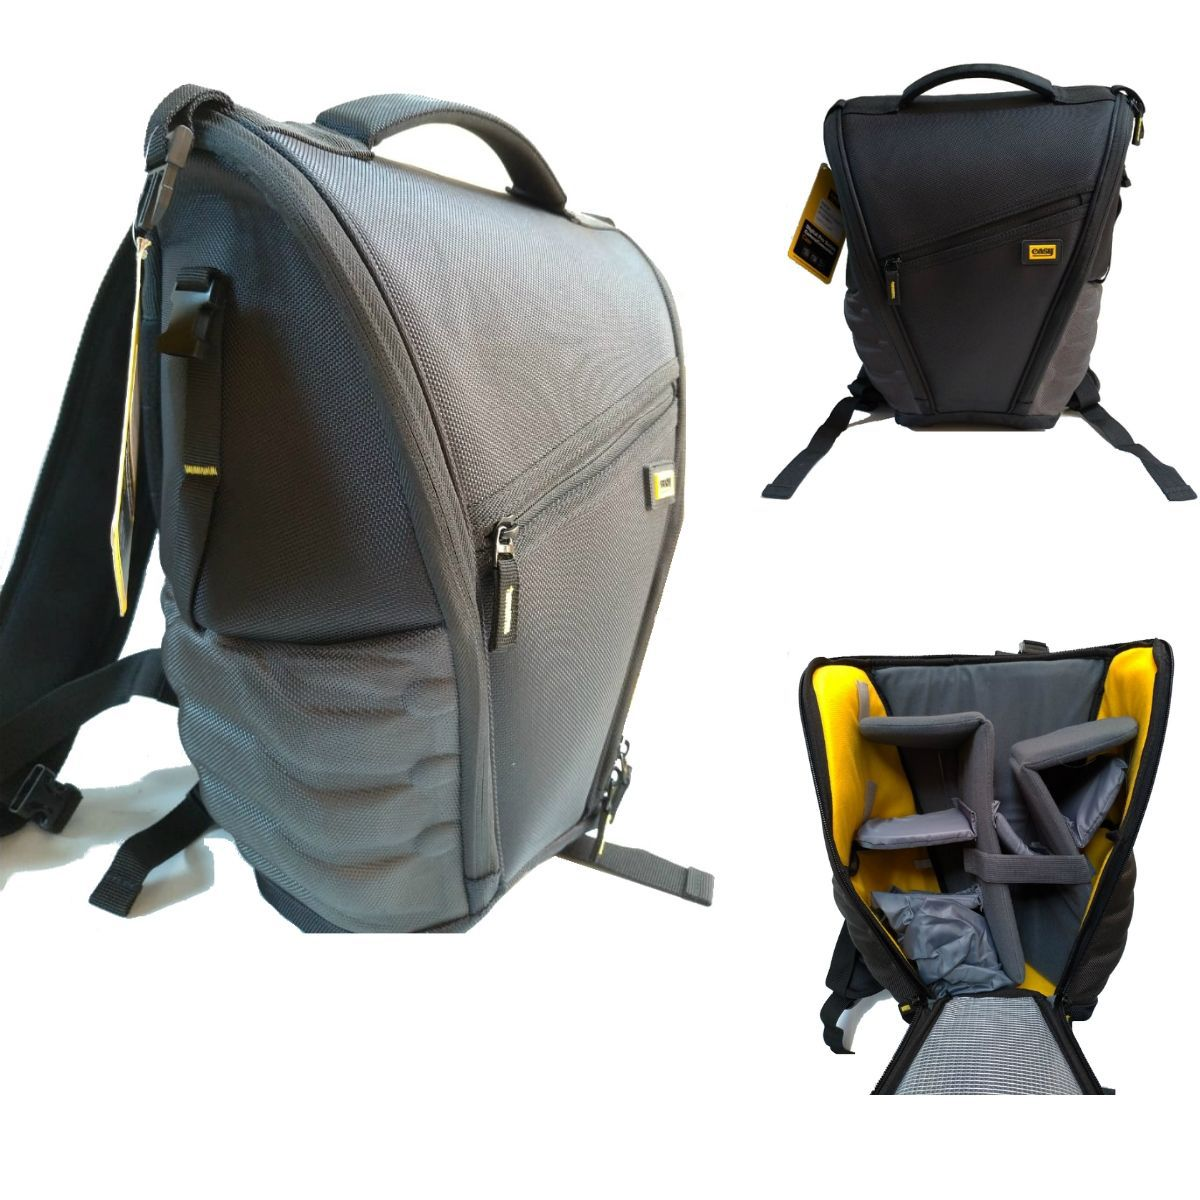 Mochila Easy Profissional Para Fotografia Resistente E Segura - EC-8861